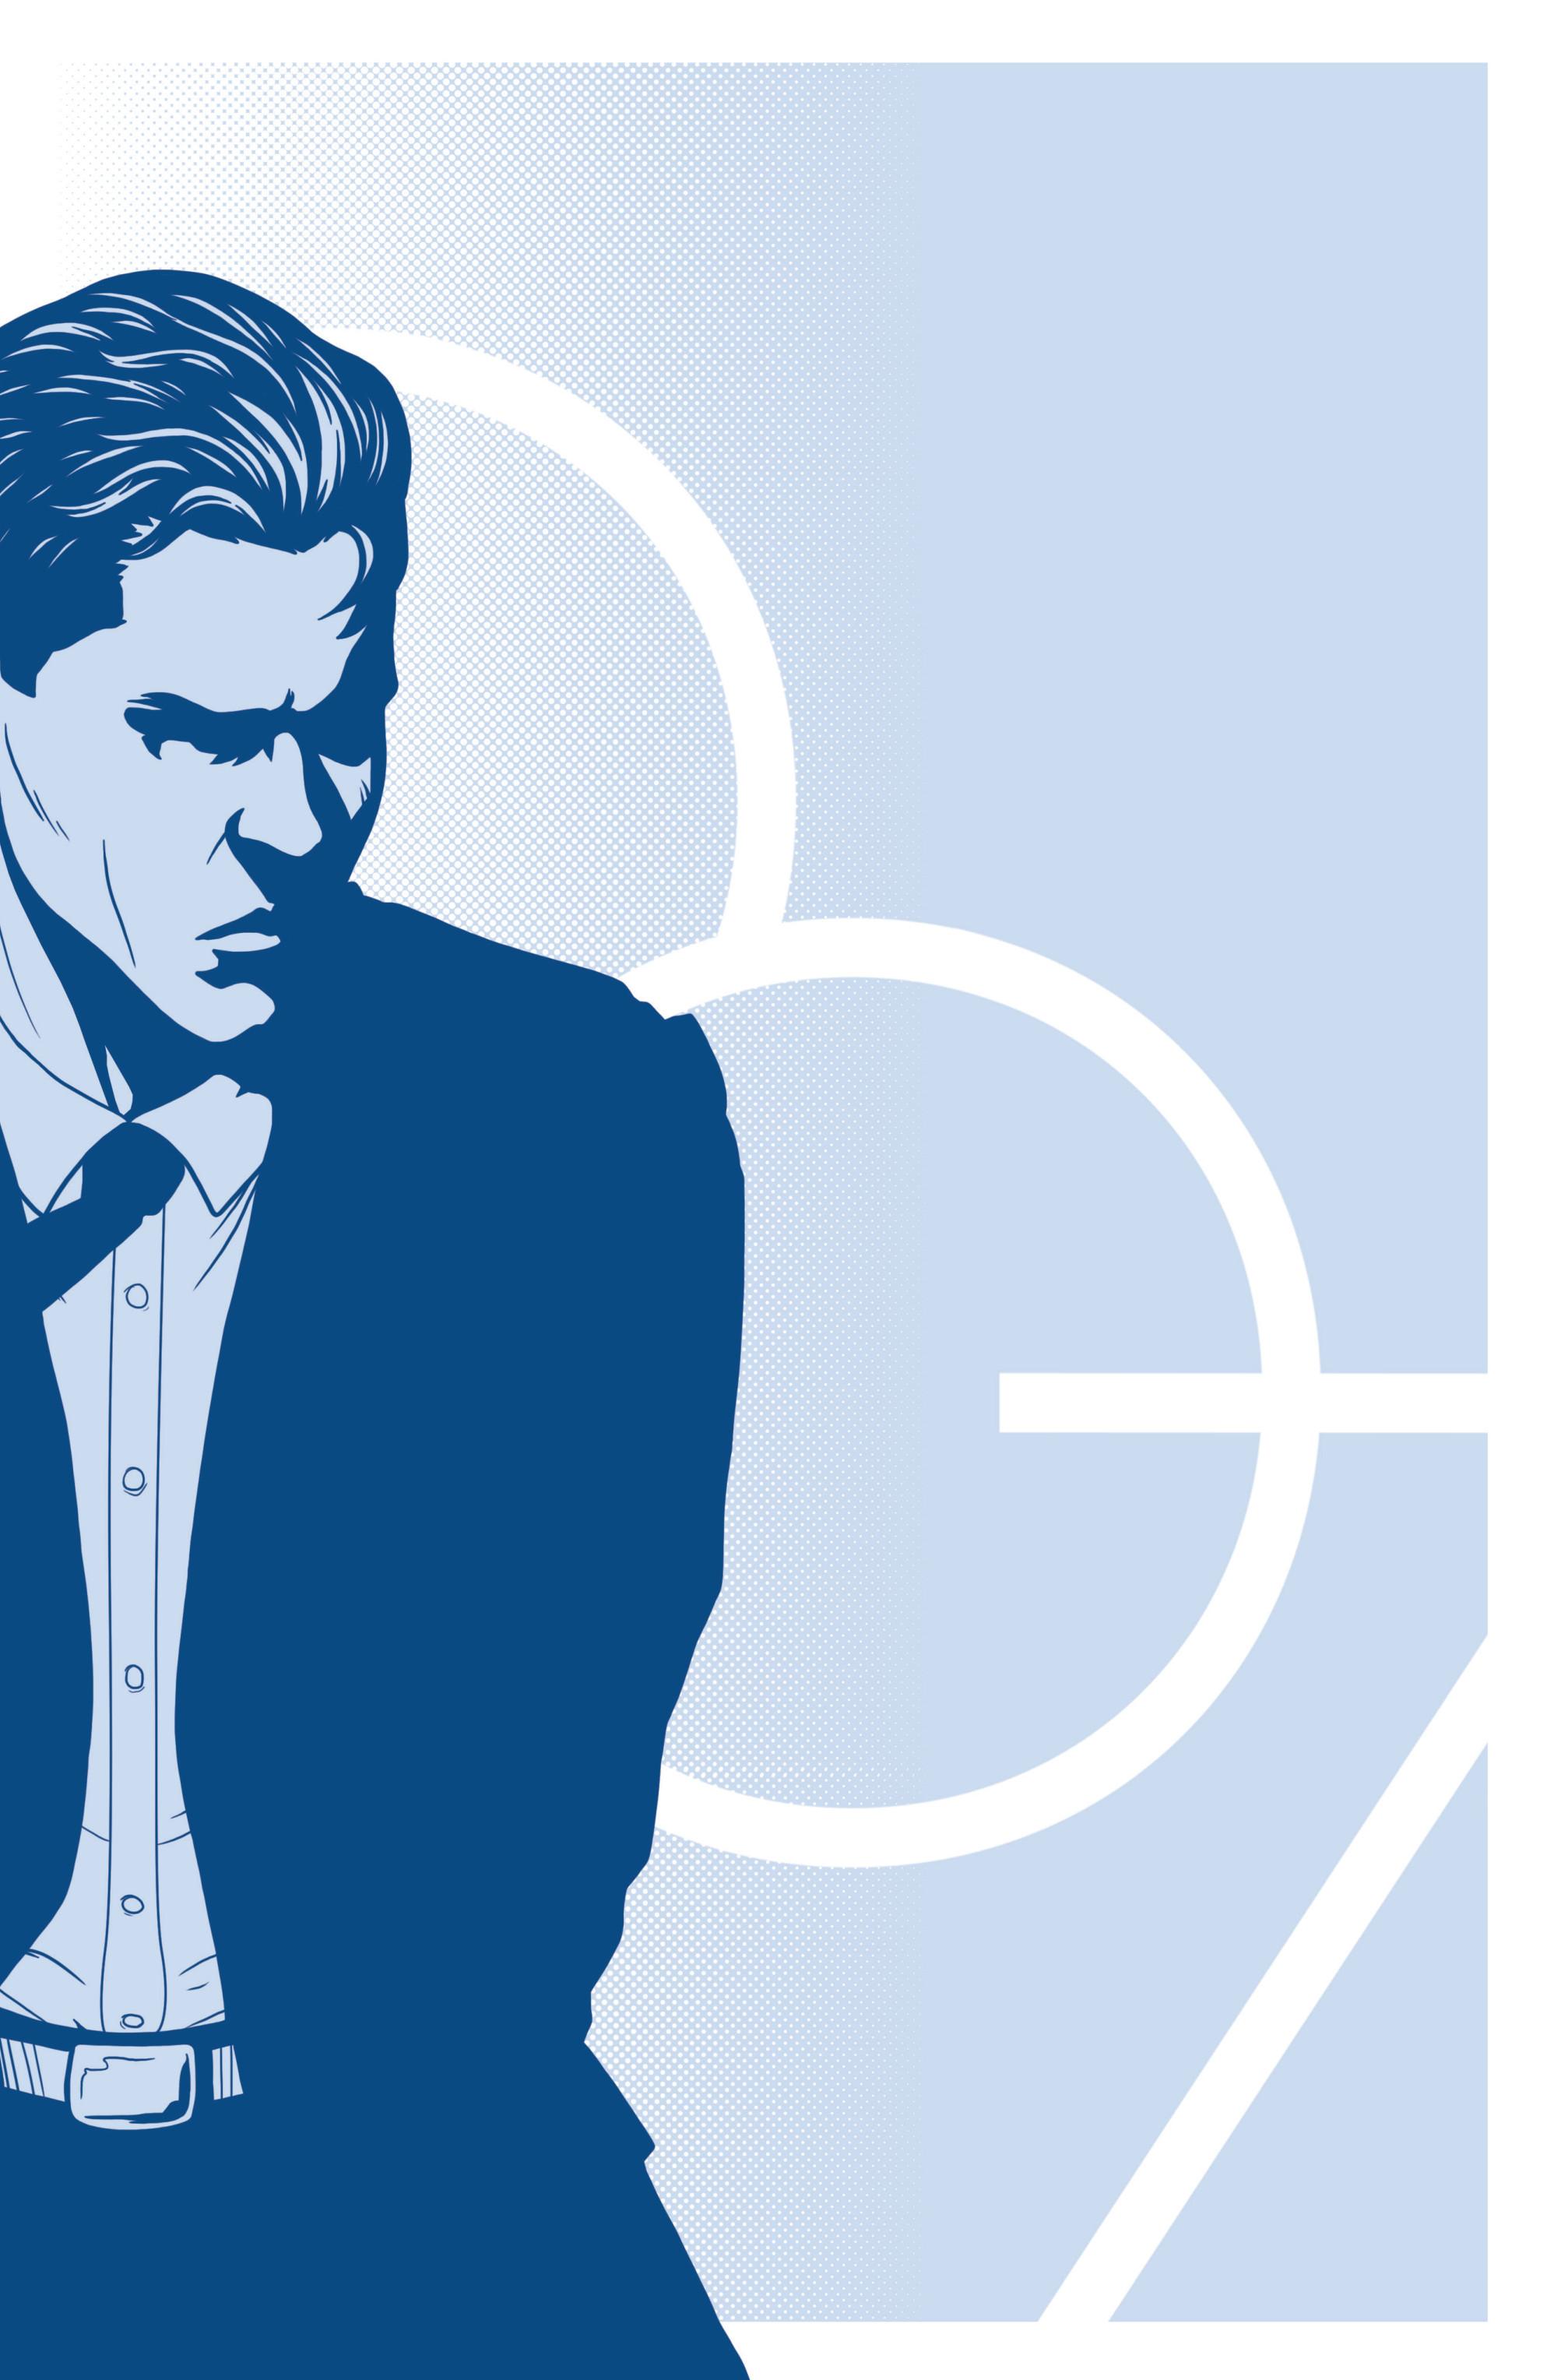 Read online James Bond: Service comic -  Issue # Full - 3